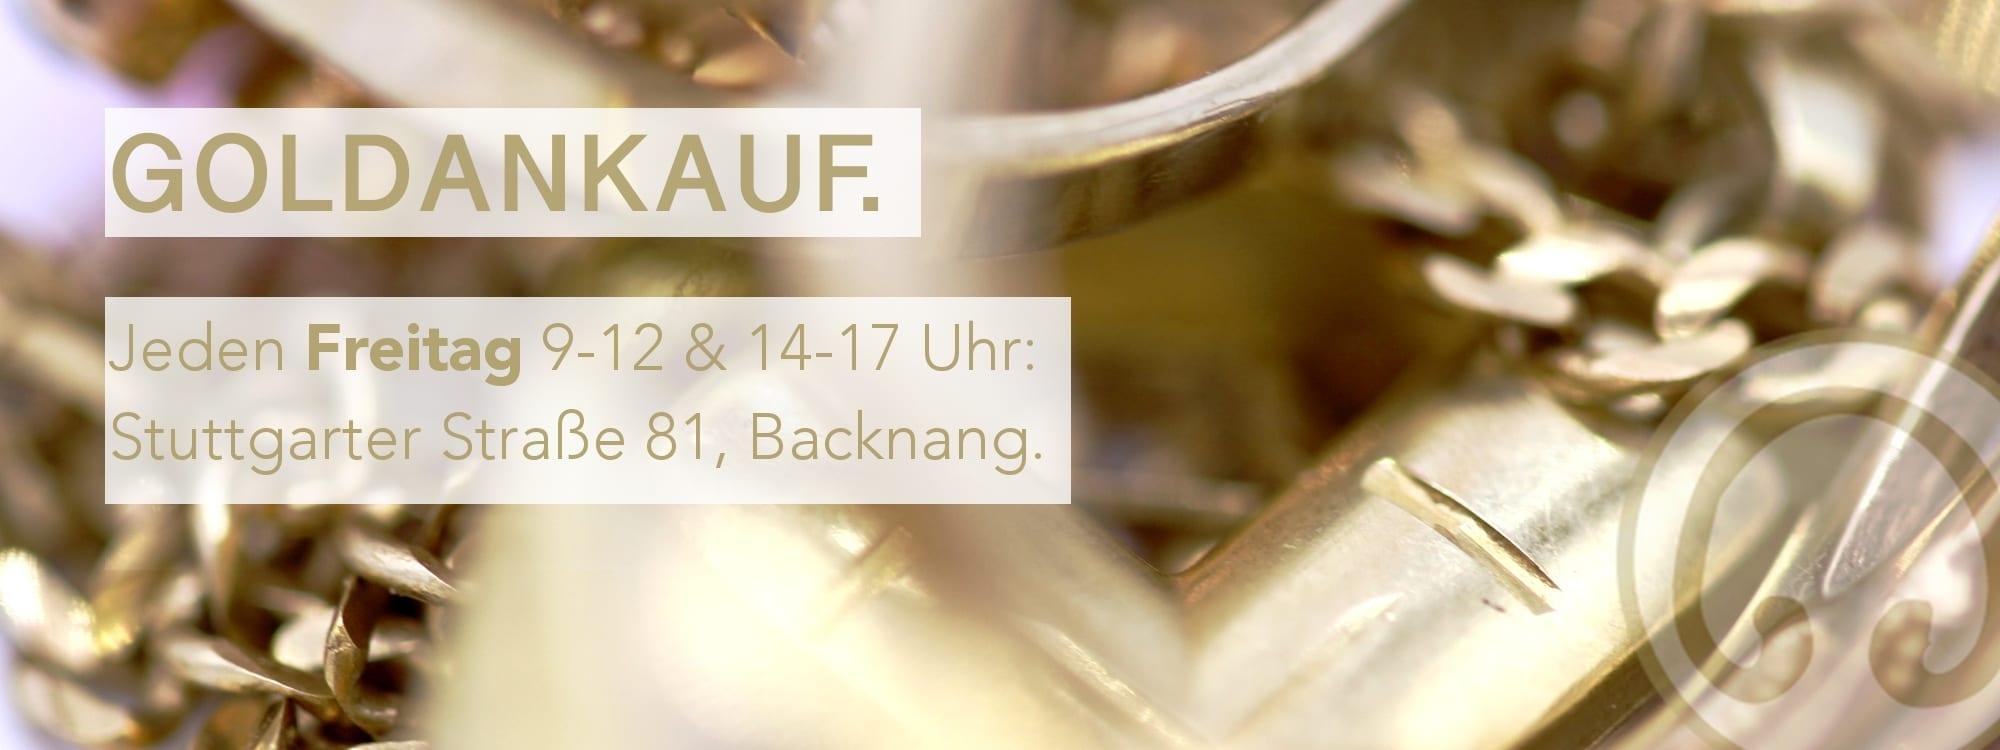 Haushaltsauflösung Stuttgart killesberg Kunst Erbschaft baden baden